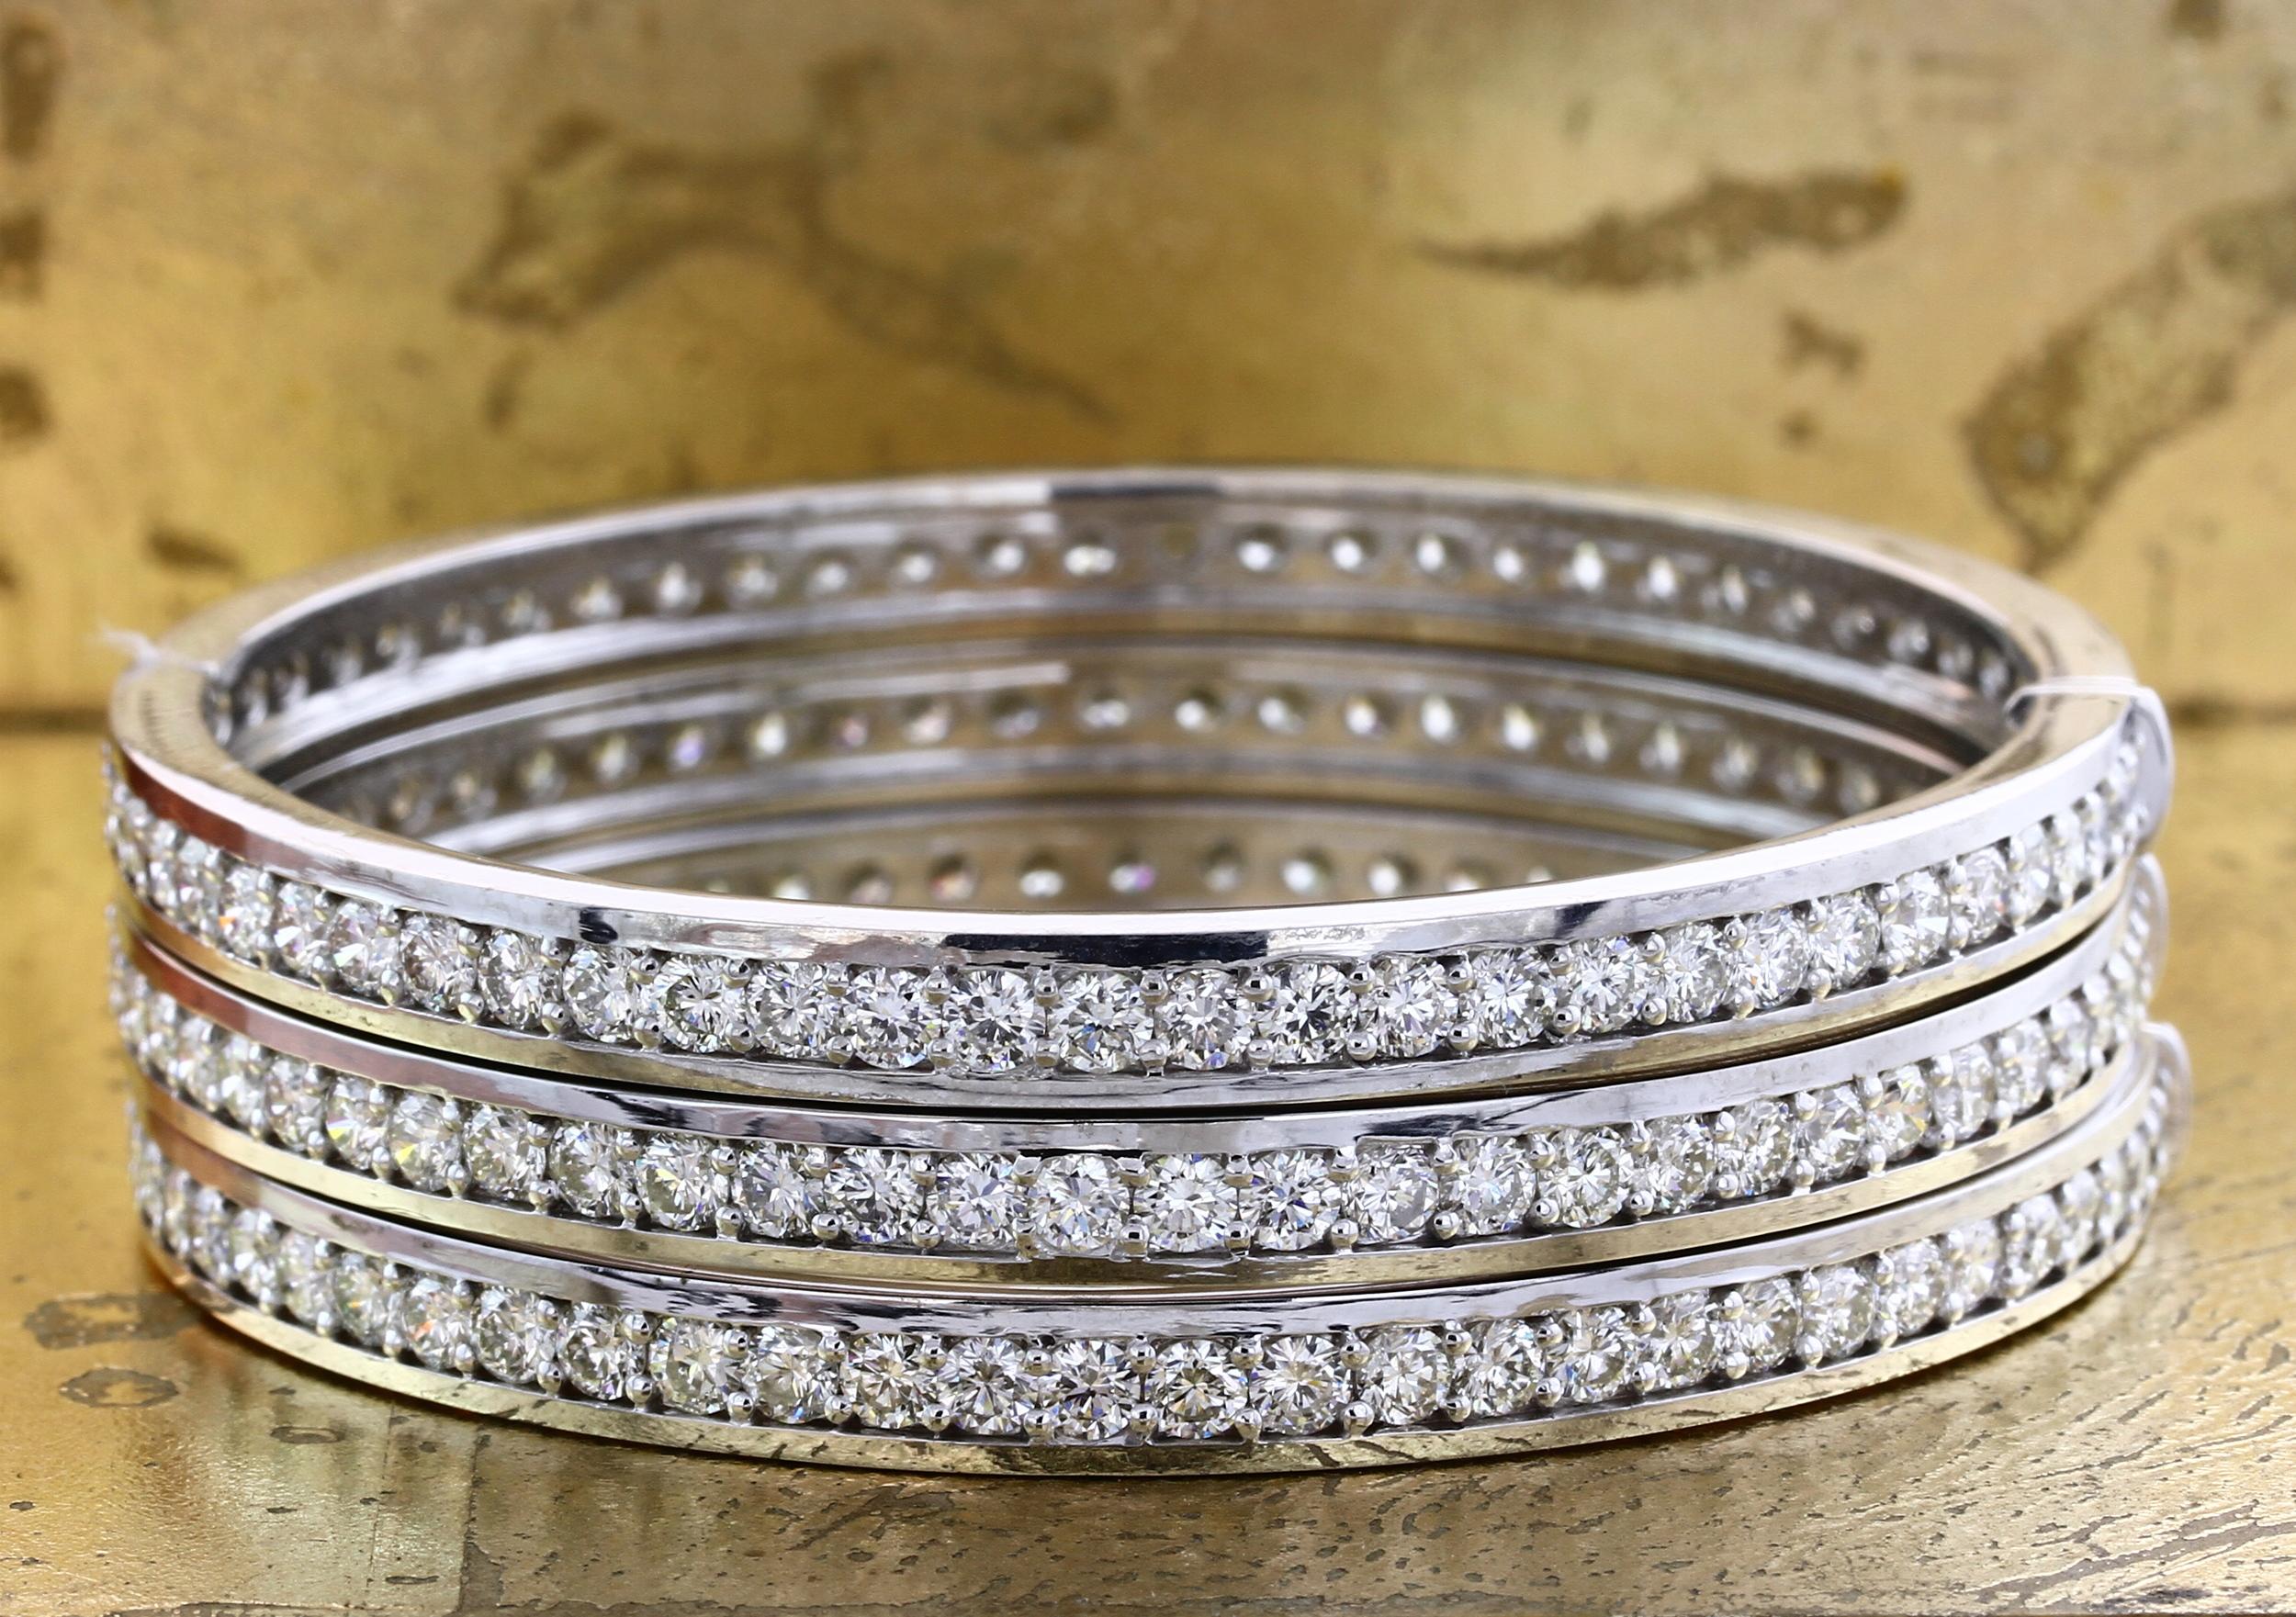 Stackable Diamond Bangles - Item No: 0013815-16-17